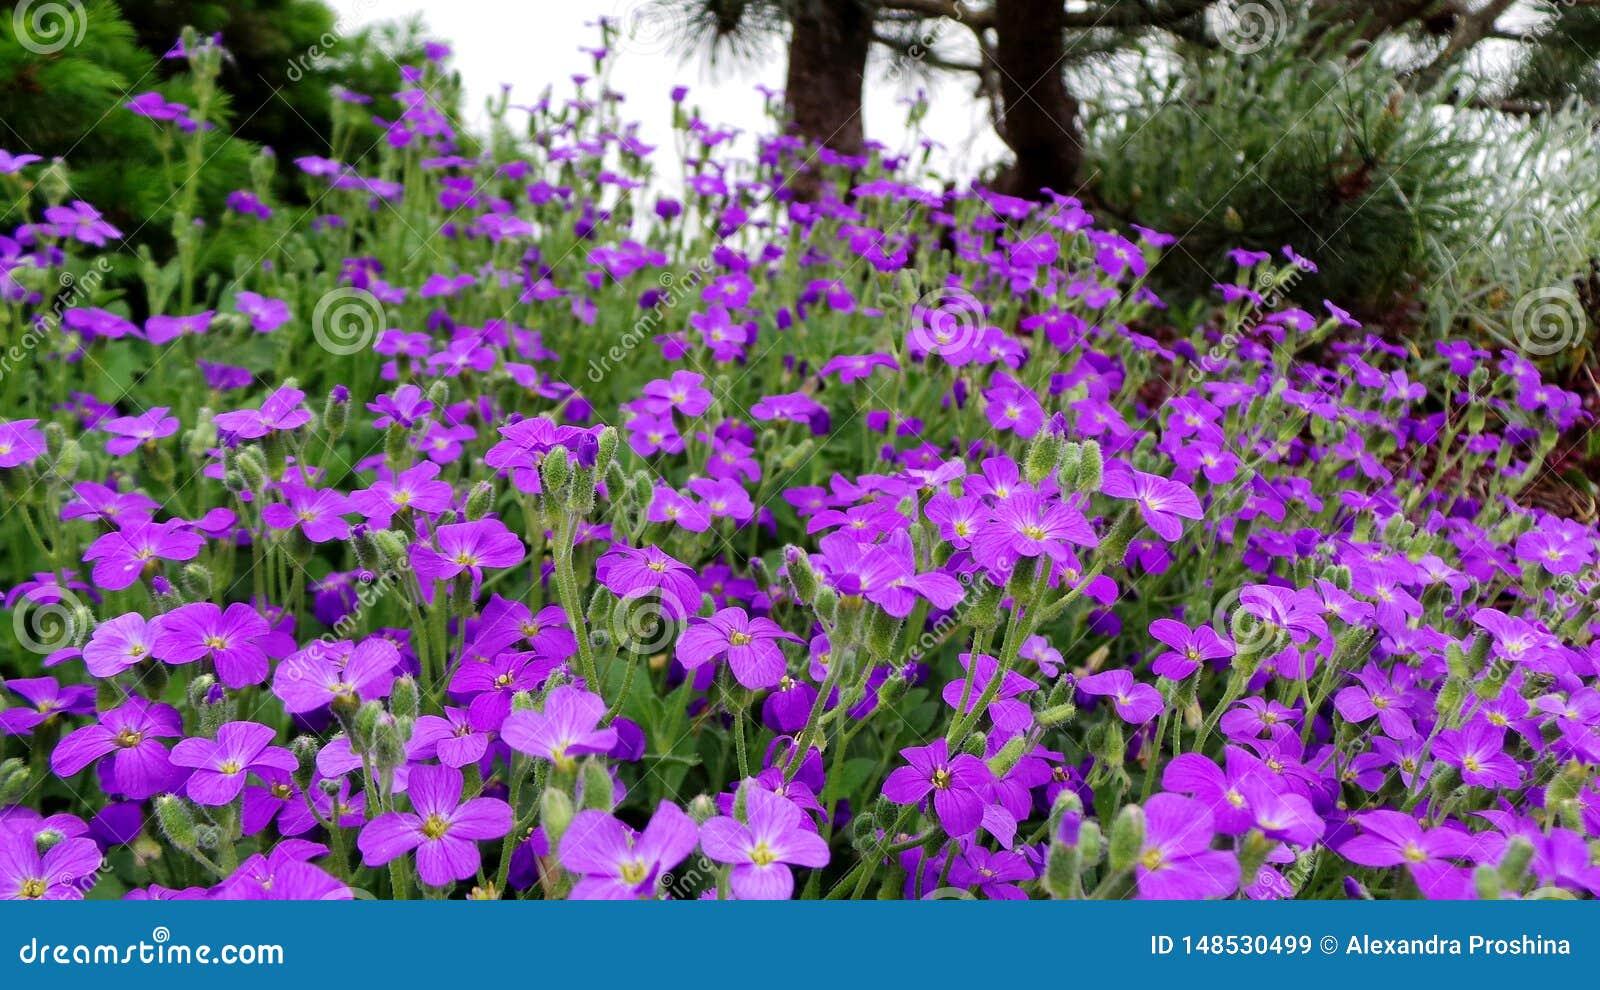 Aubrietta alpine in spring rockery during flowering on a sunny day